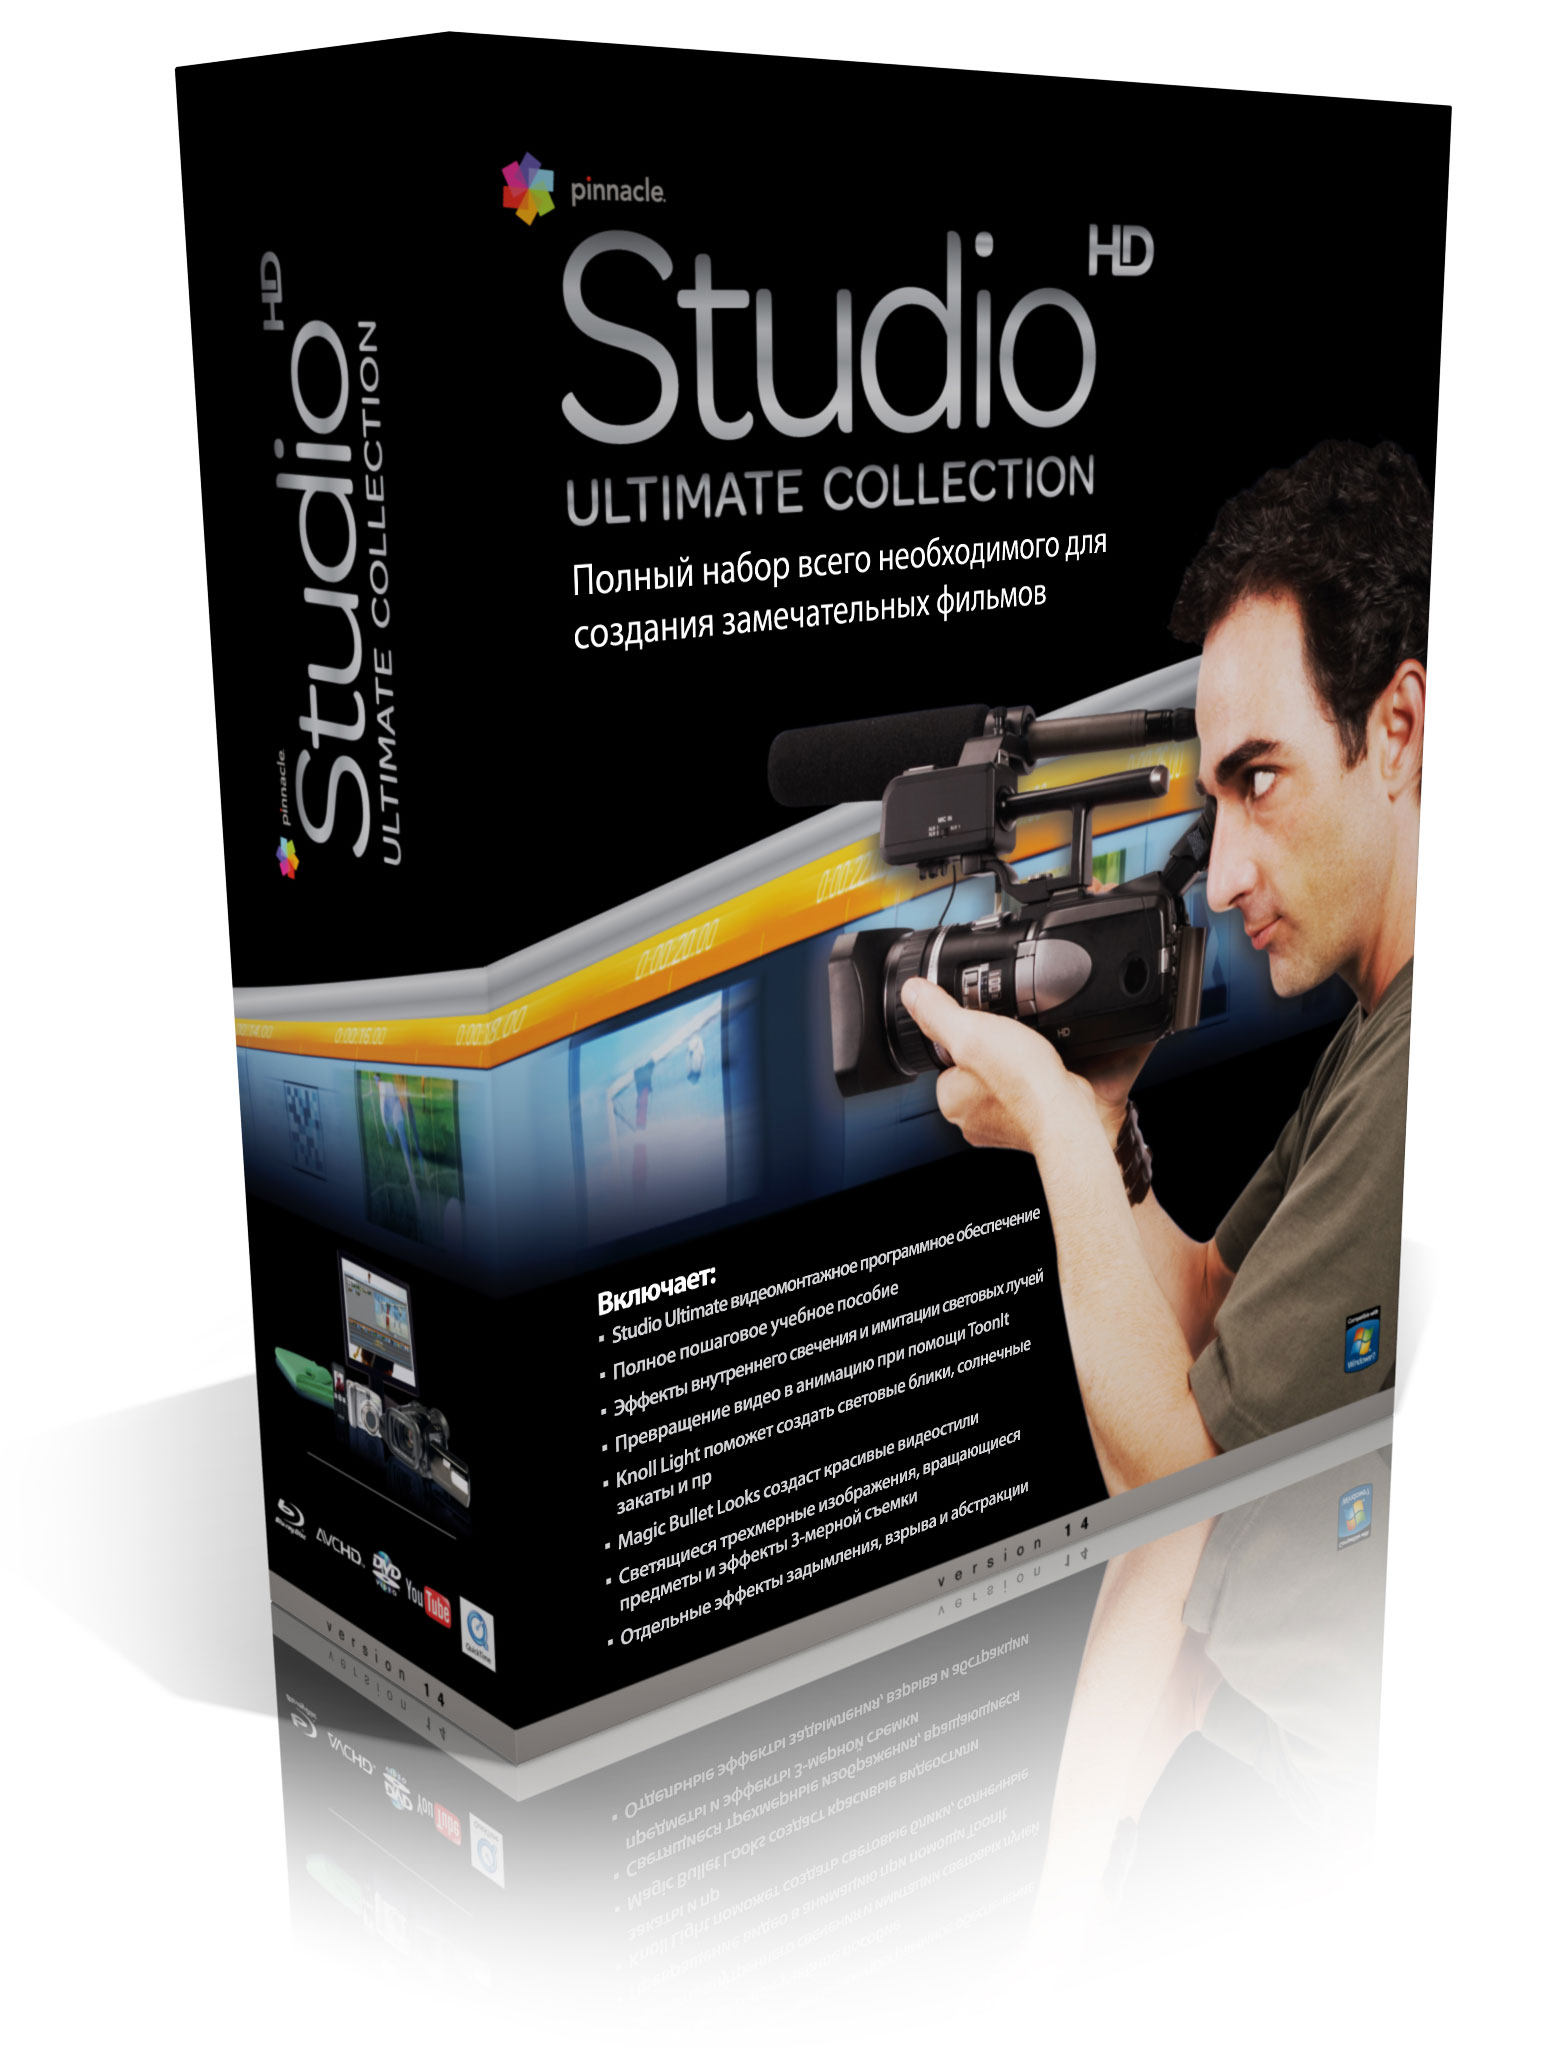 Скачать программы, pinnacle Studio HD Ultimate, collection.15